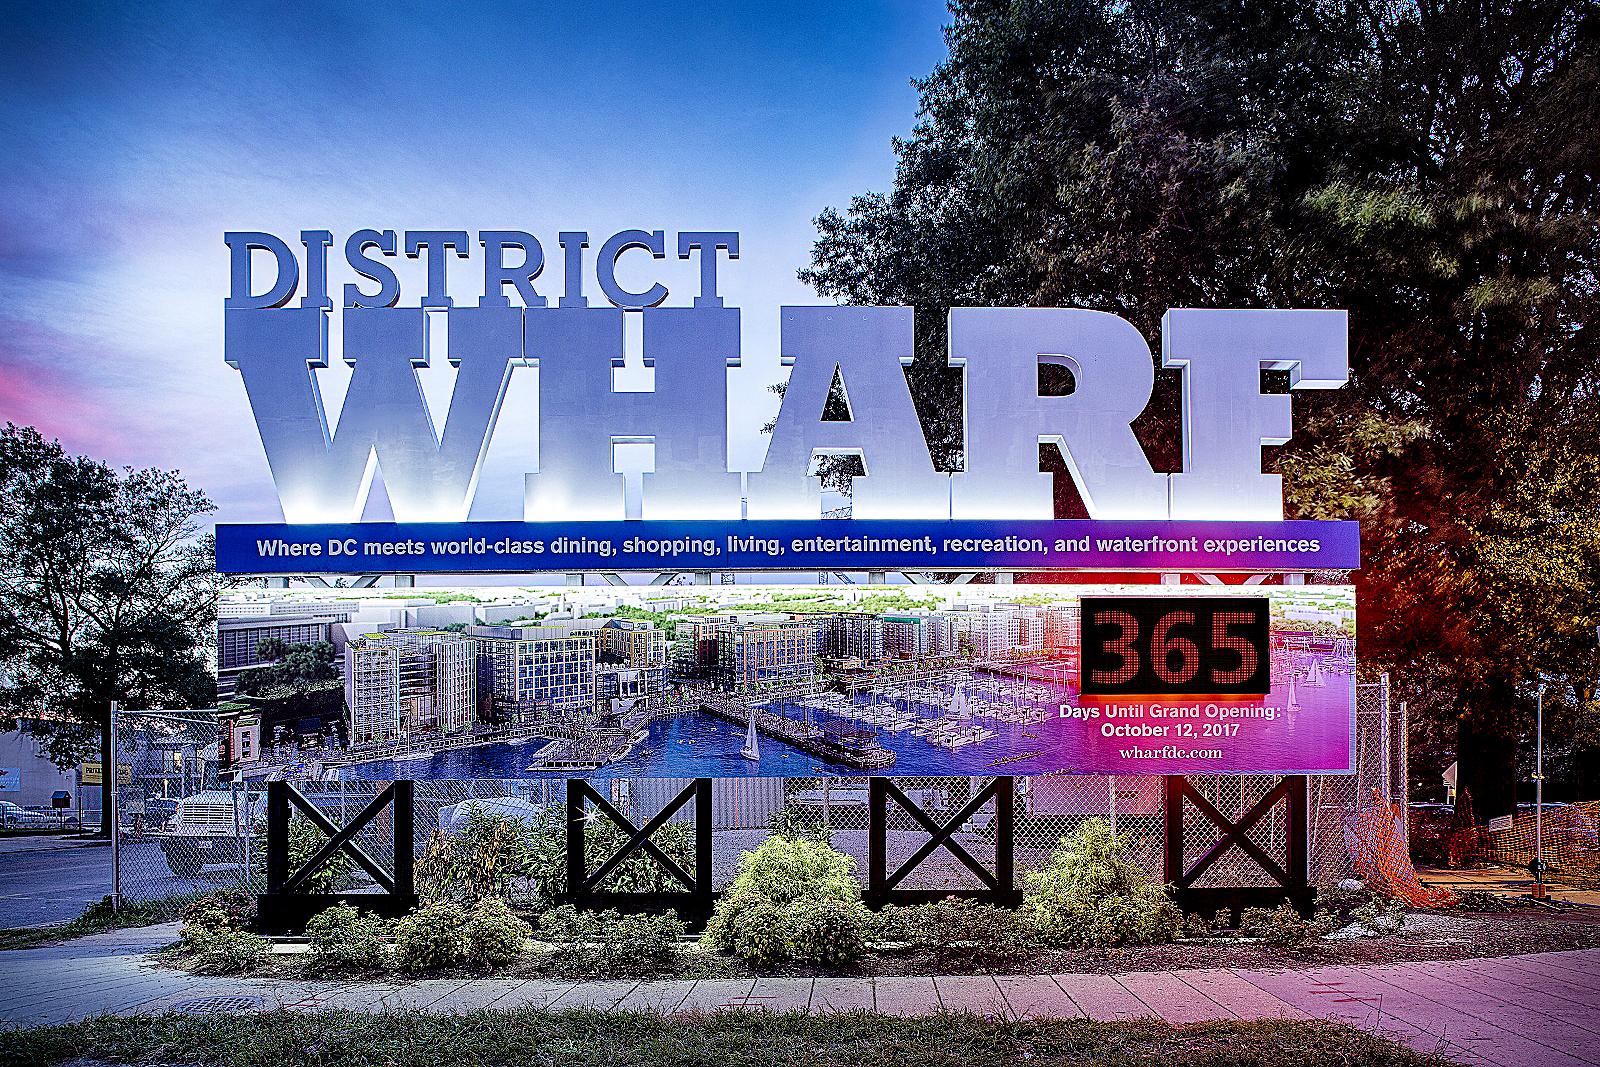 The Wharf countdown clock has been unveiled. /Photo courtesy of dcwharf.com.